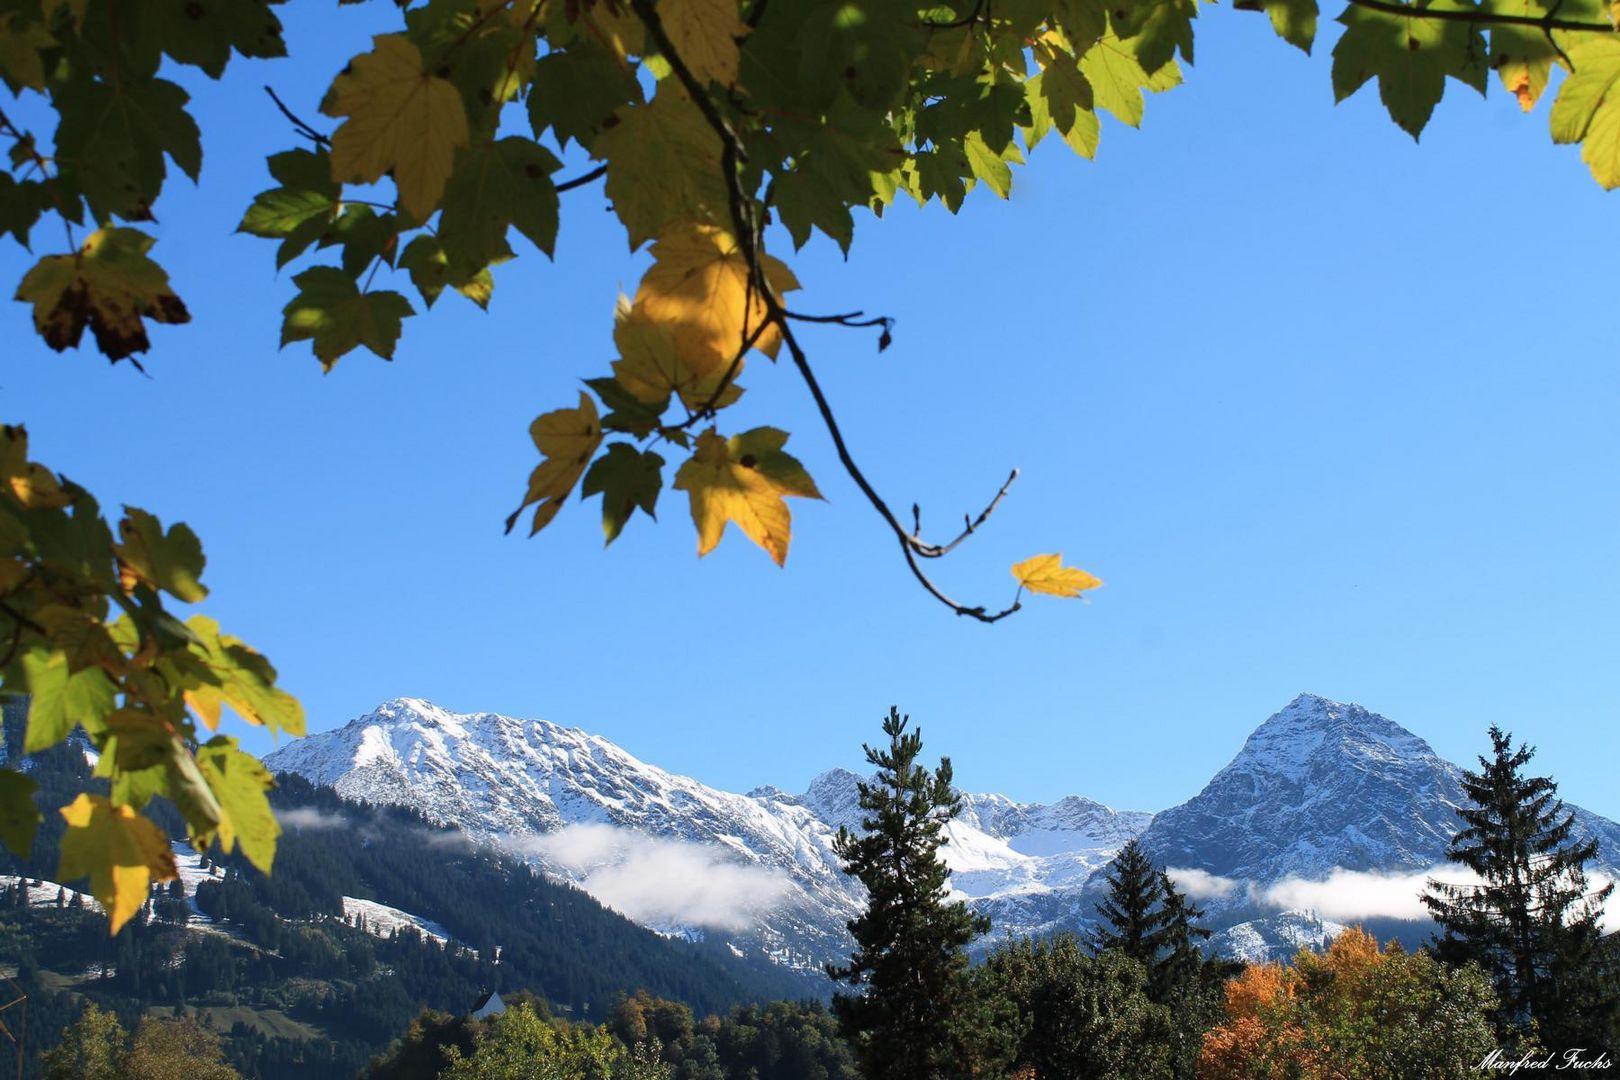 Herbst in den Allgäuer Alpen